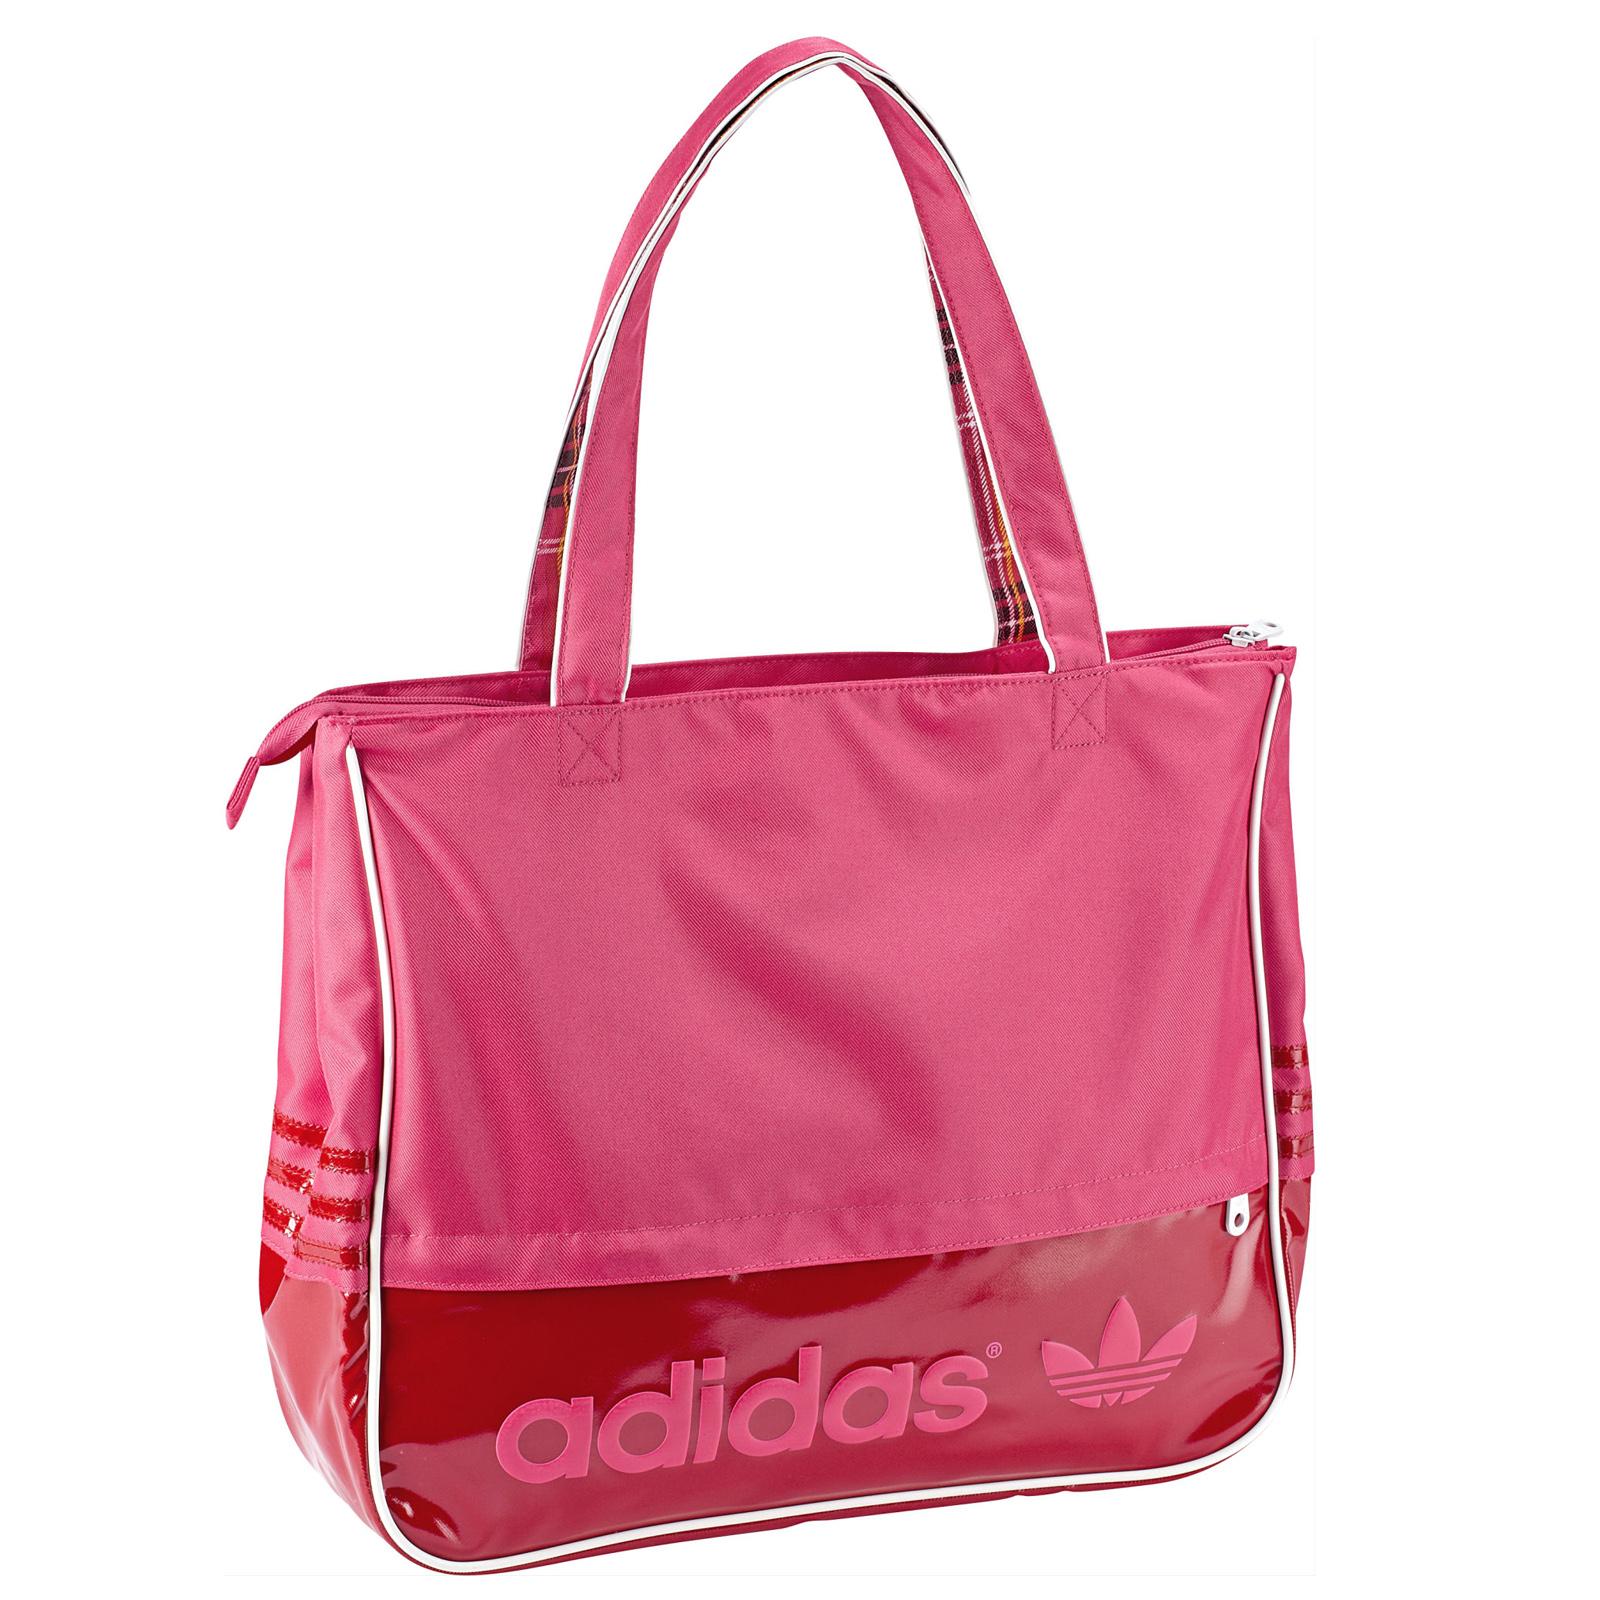 Popular Buy Small Adidas Shoulder Bag U0026gt; OFF51% Discounted